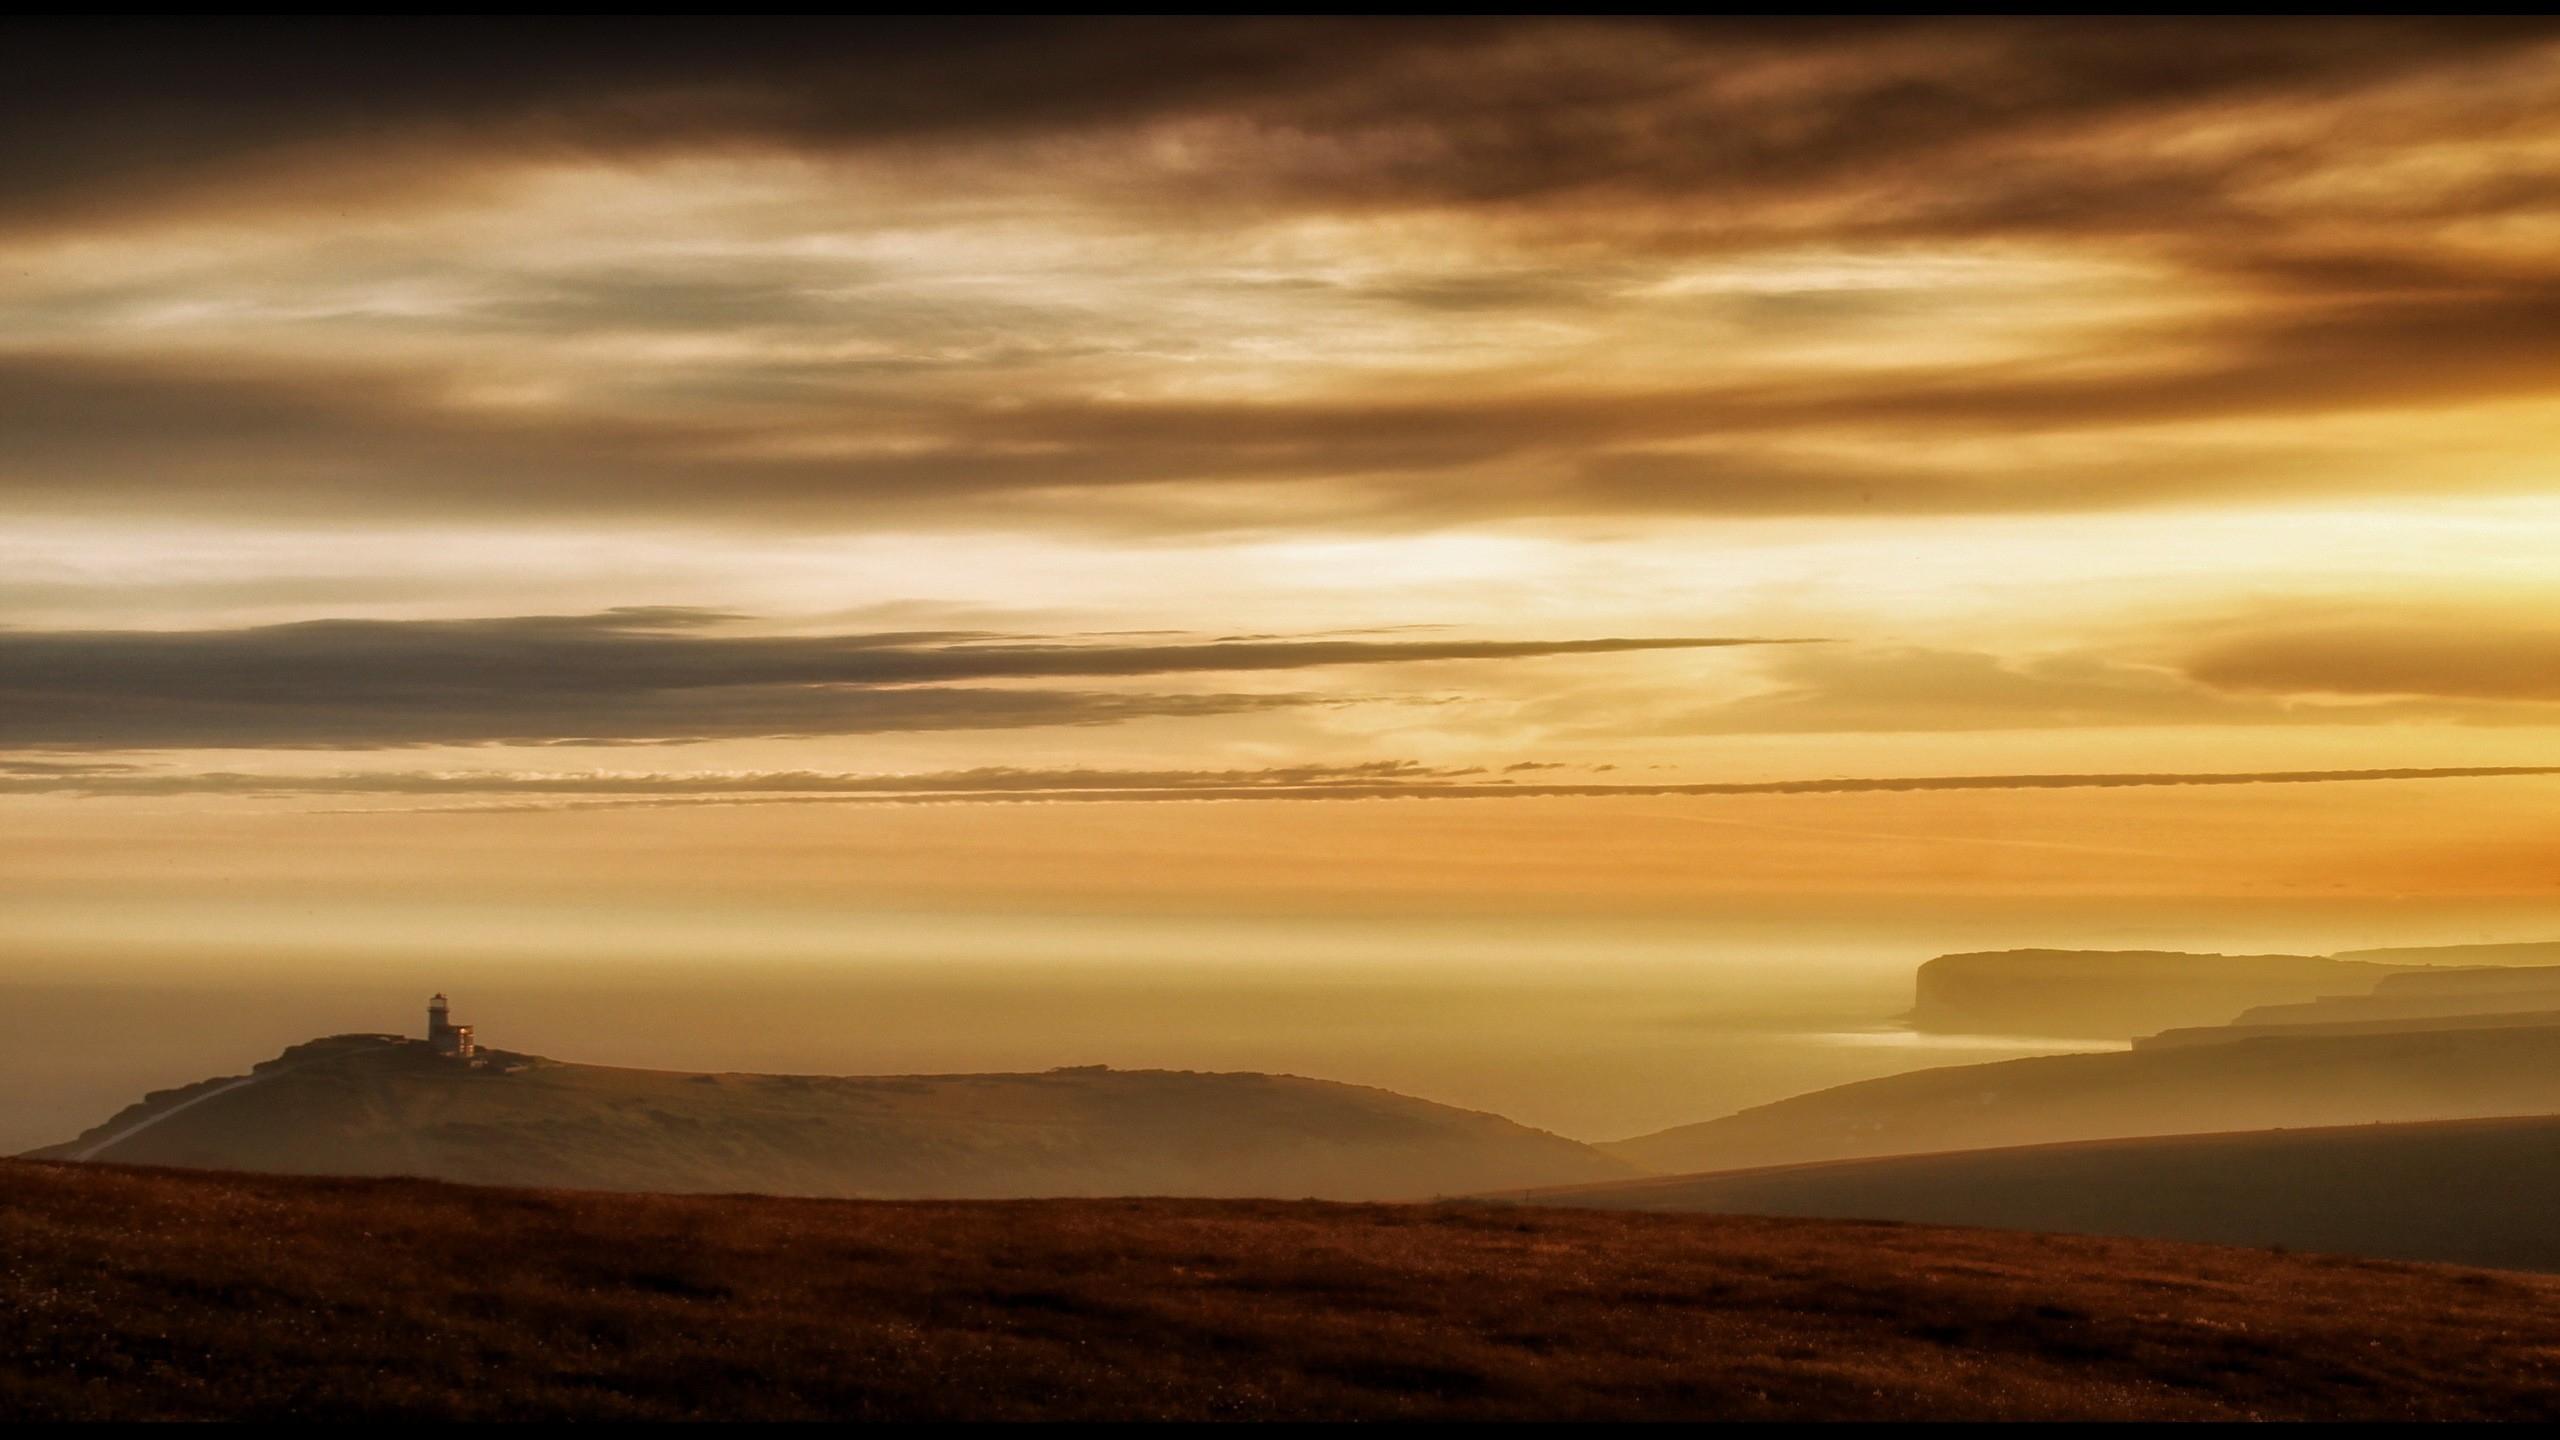 природа горизонт закат небо облака туман nature horizon sunset the sky clouds fog скачать